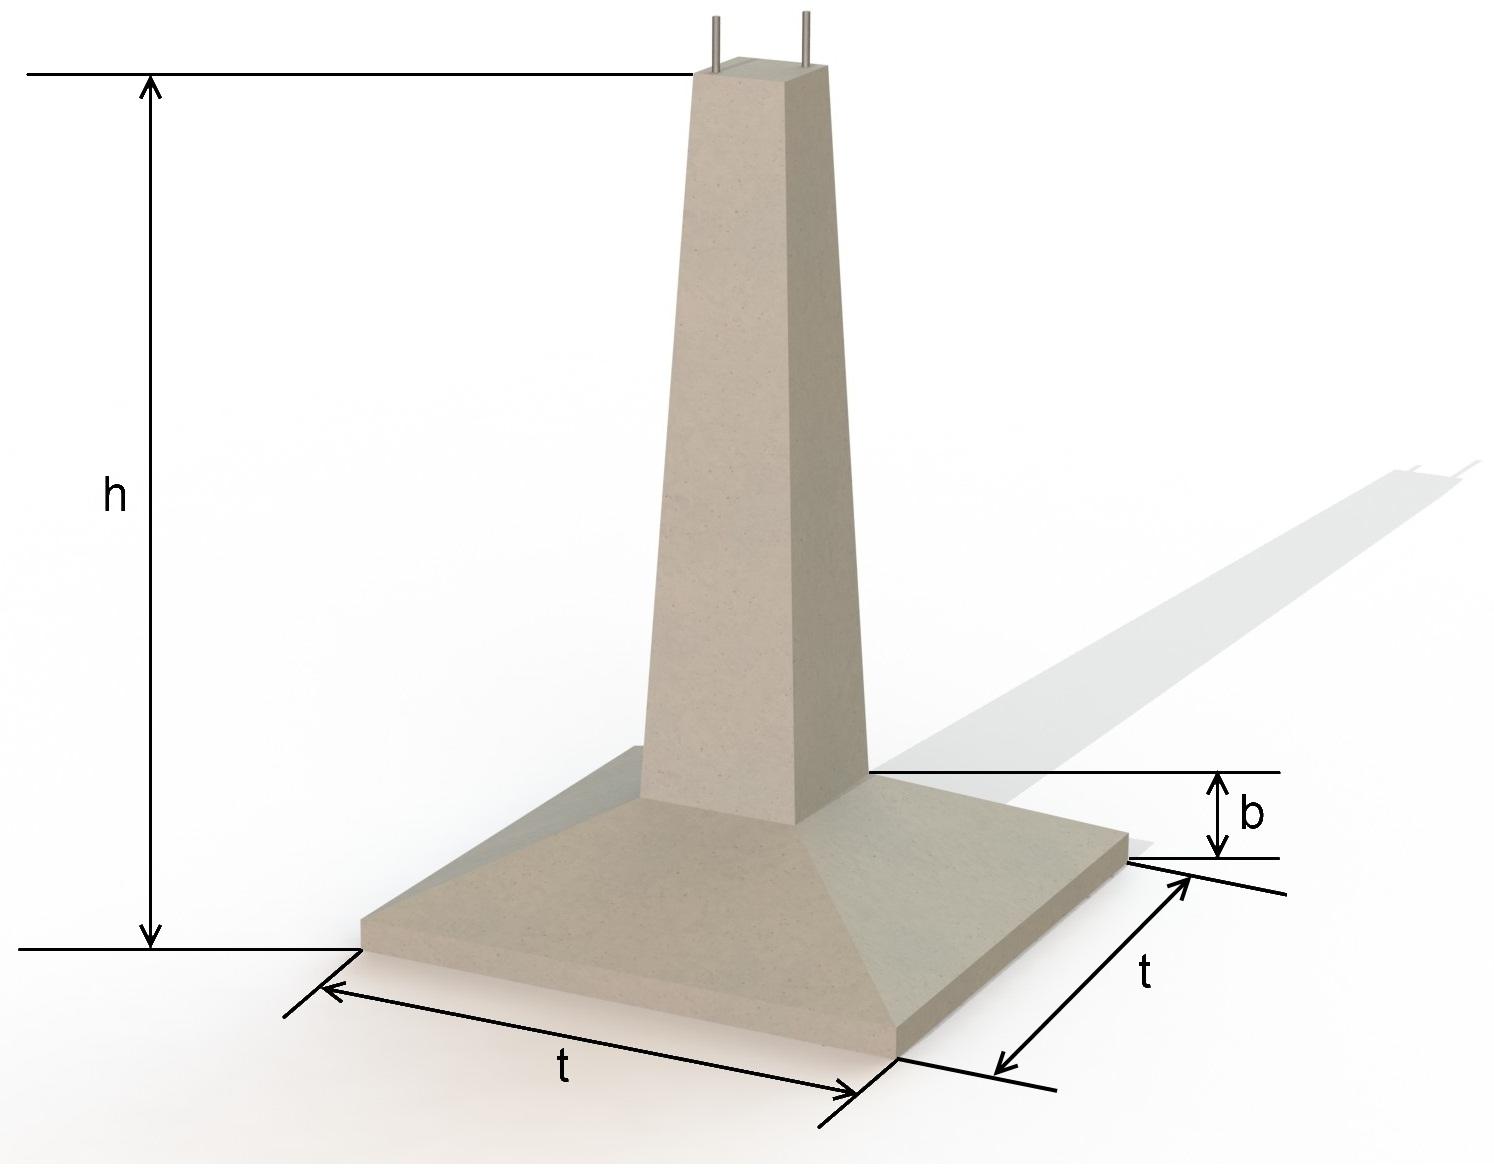 Фундамент Ф1 под опоры ЛЭП